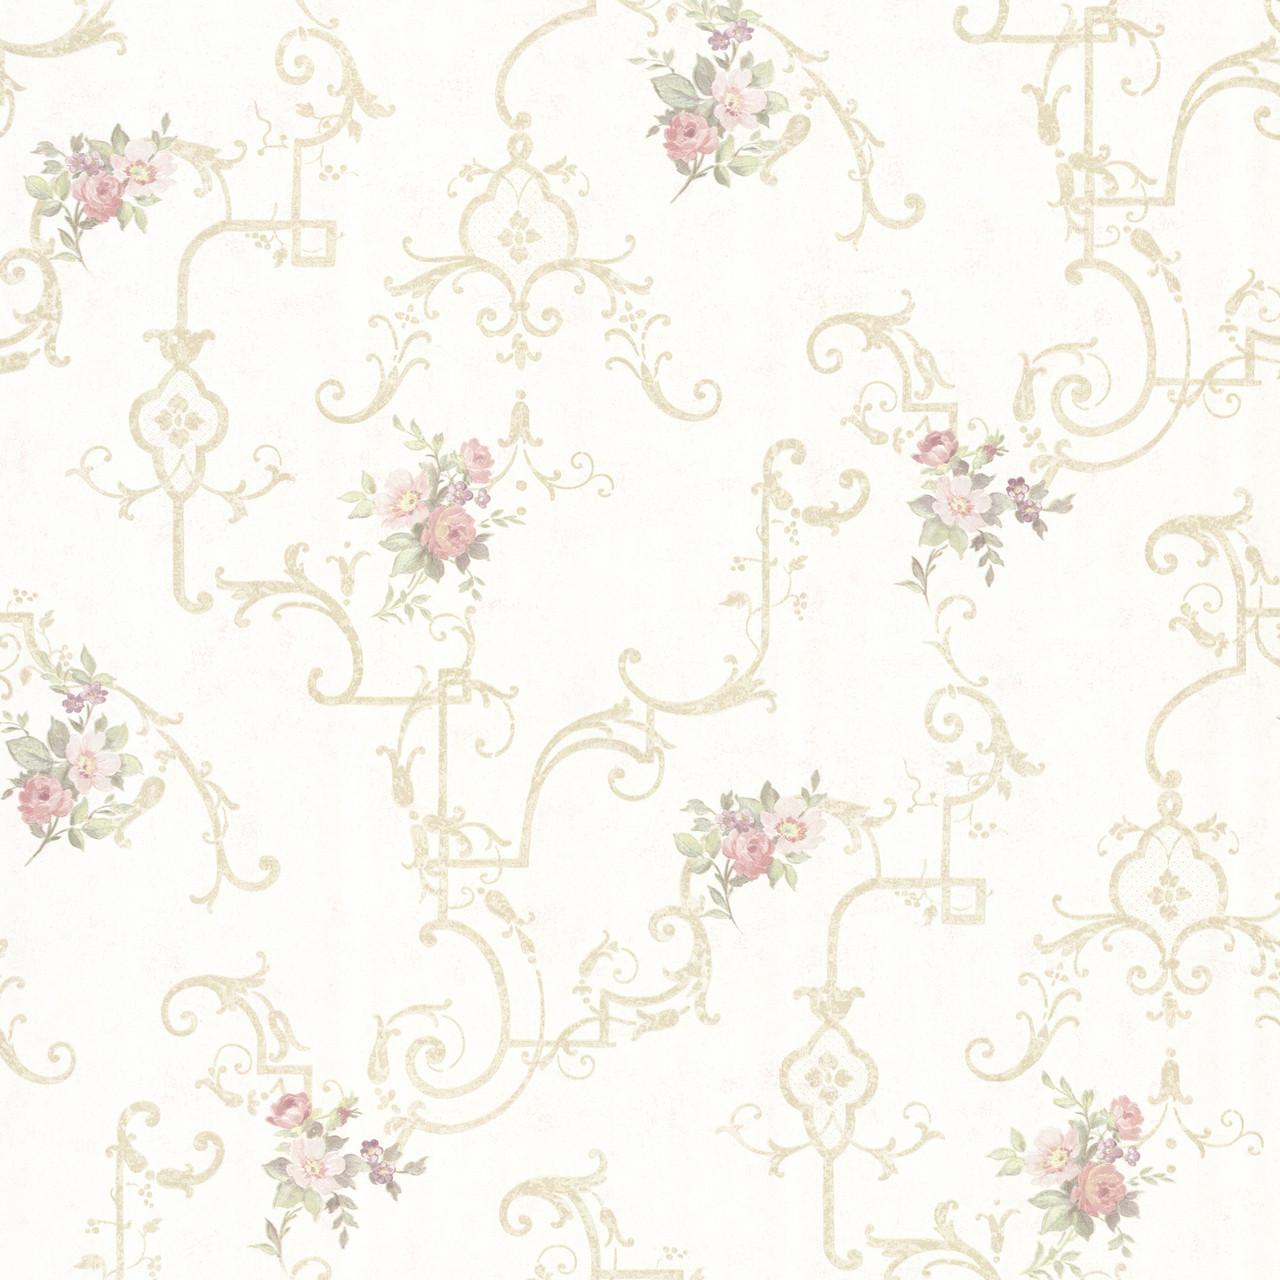 992 68308 Lori Light Green Floral Trellis Wallpaper